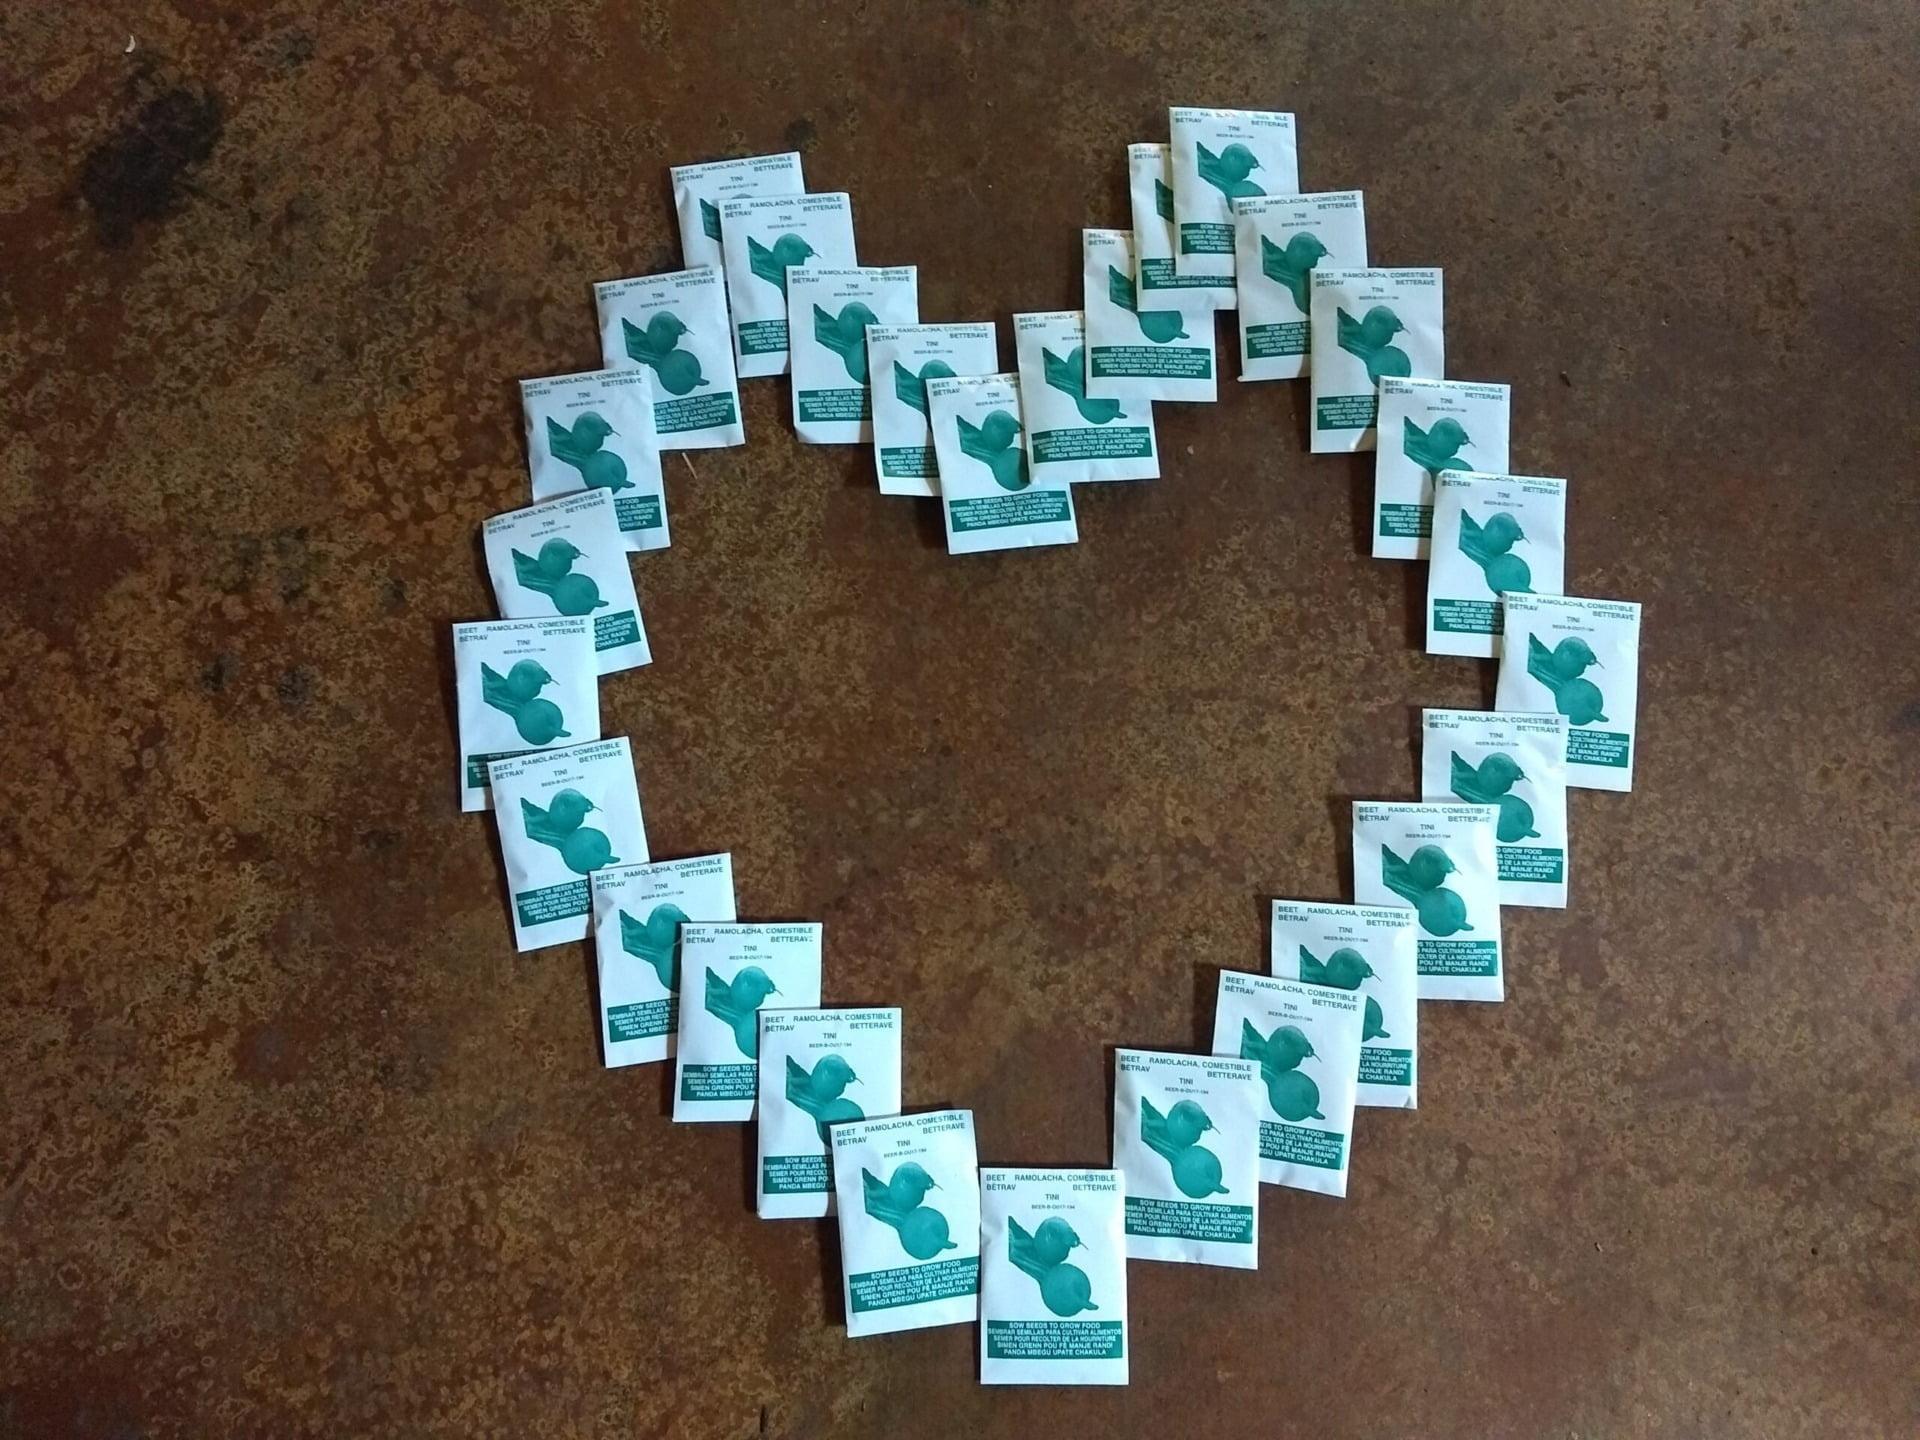 heart of tea bags